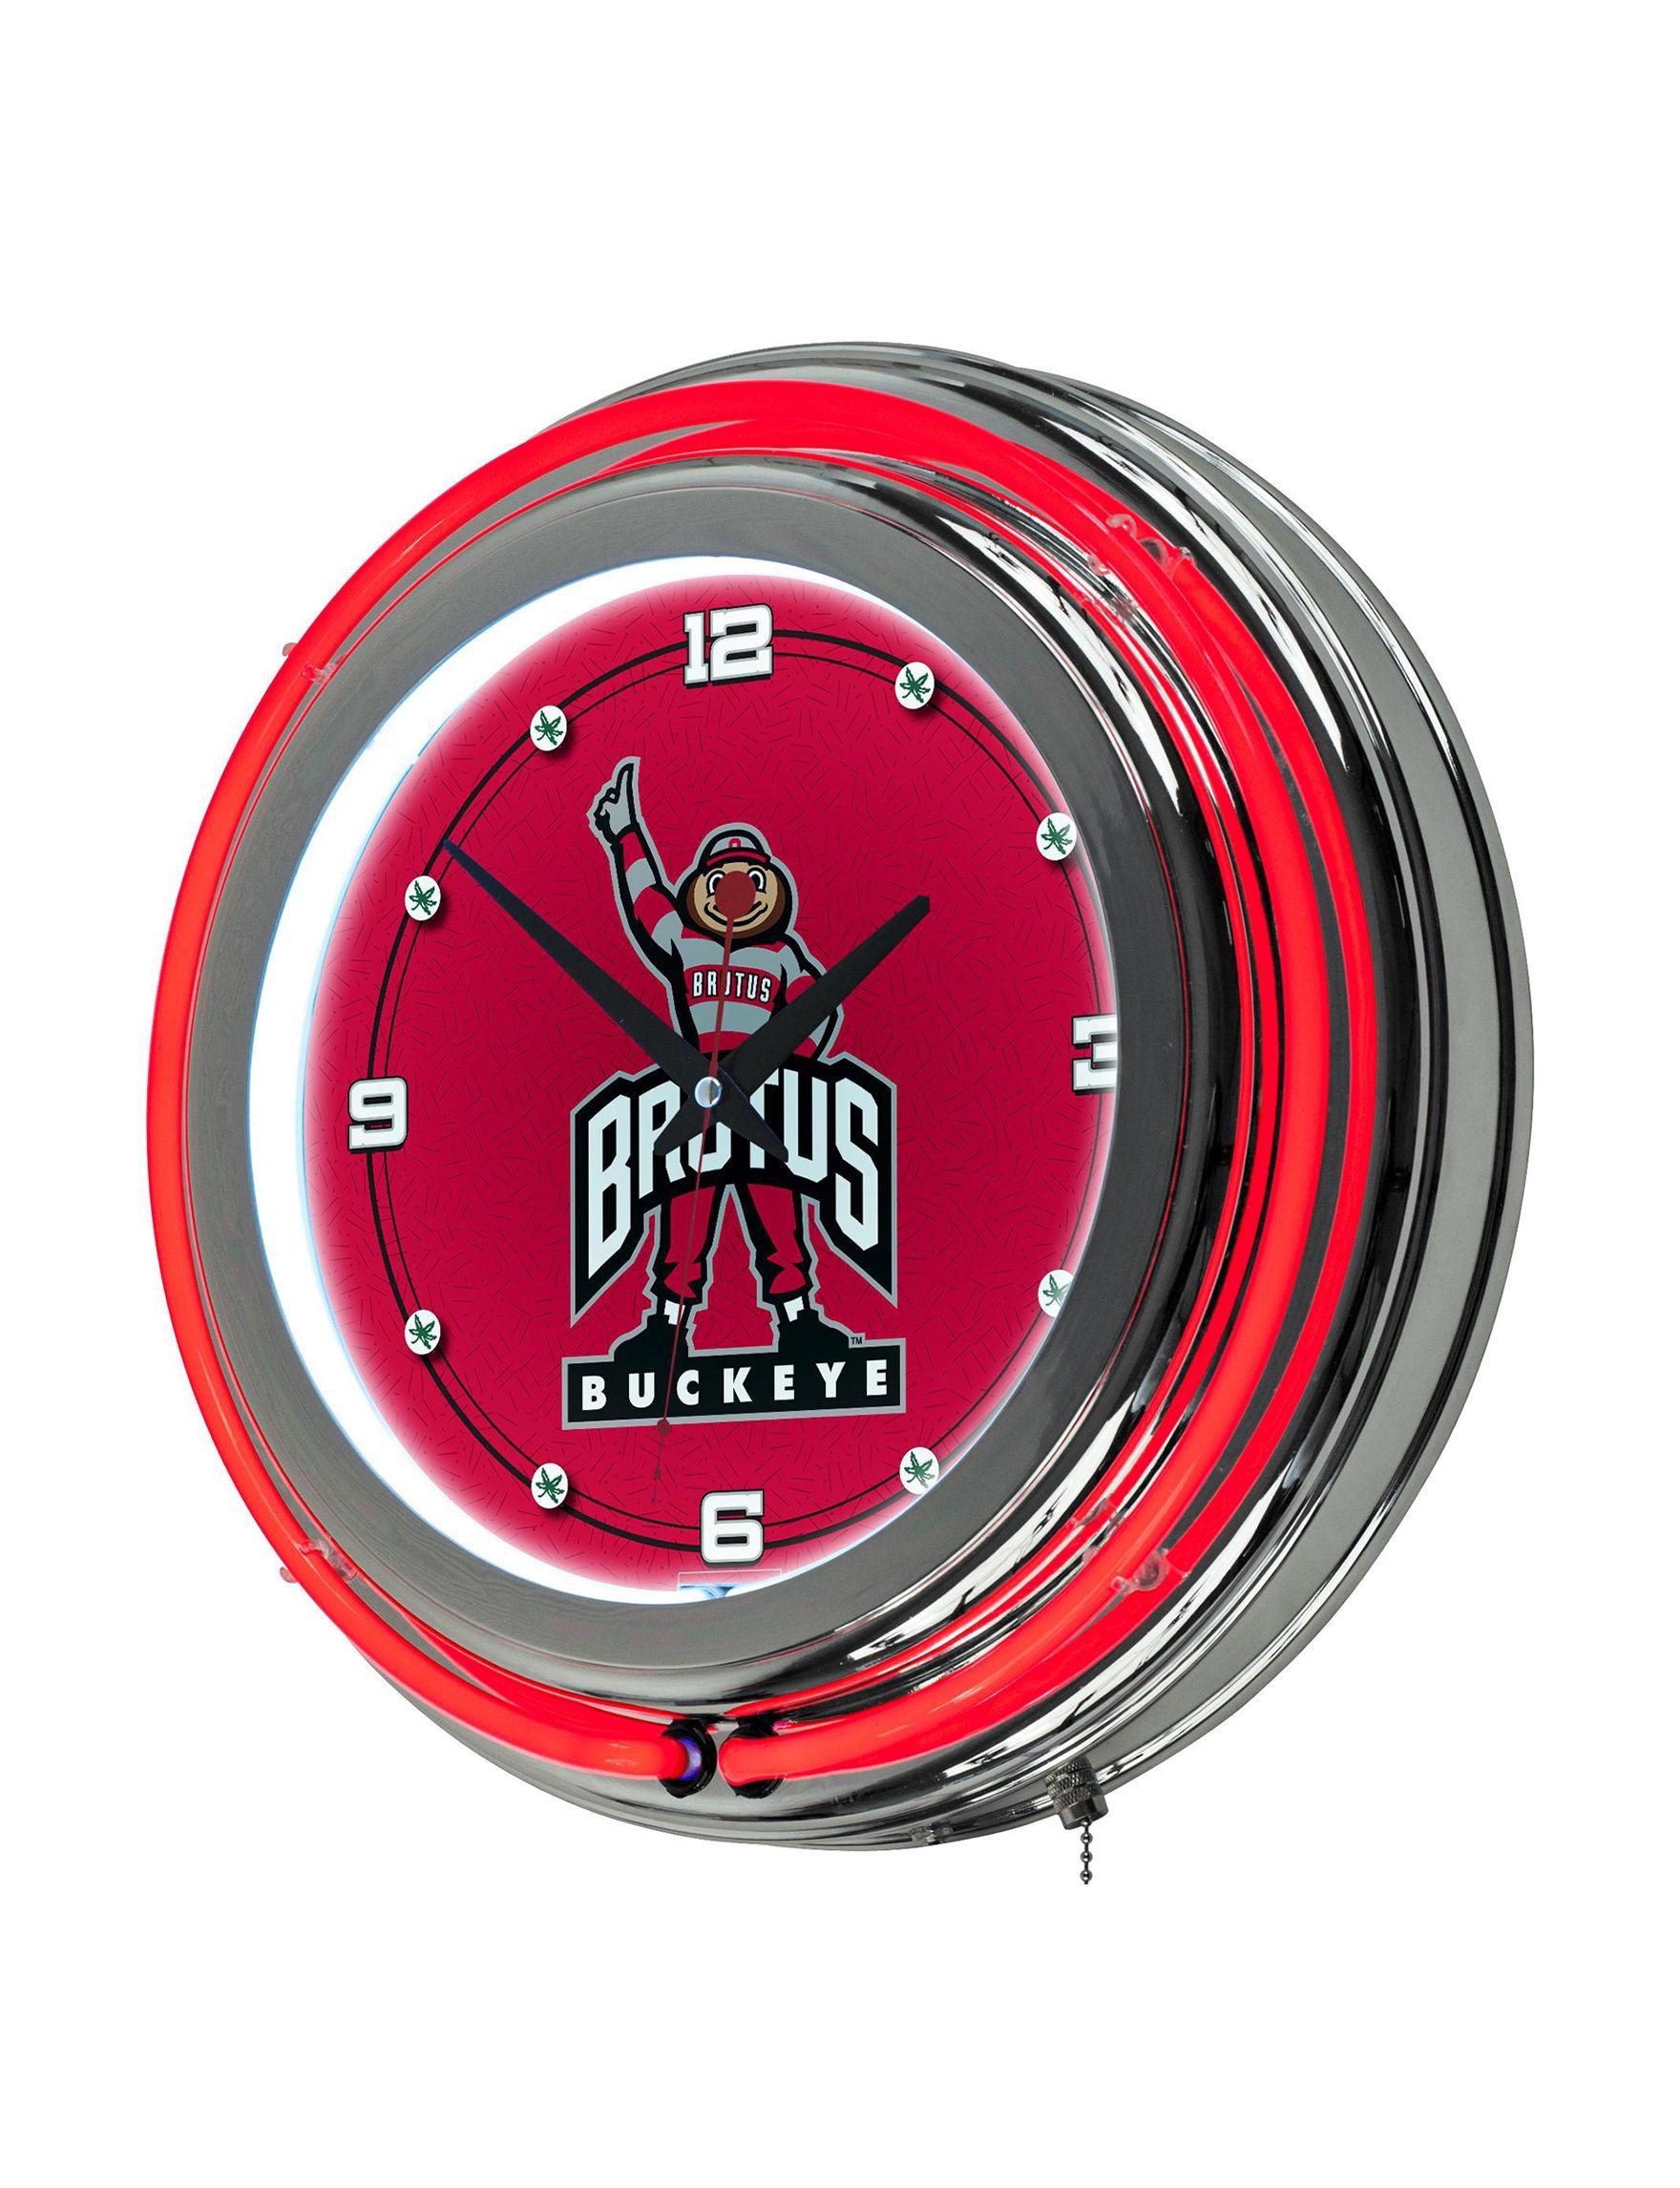 NCAA Red Decorative Objects Wall Art Wall Clocks Home Accents NCAA Wall Decor